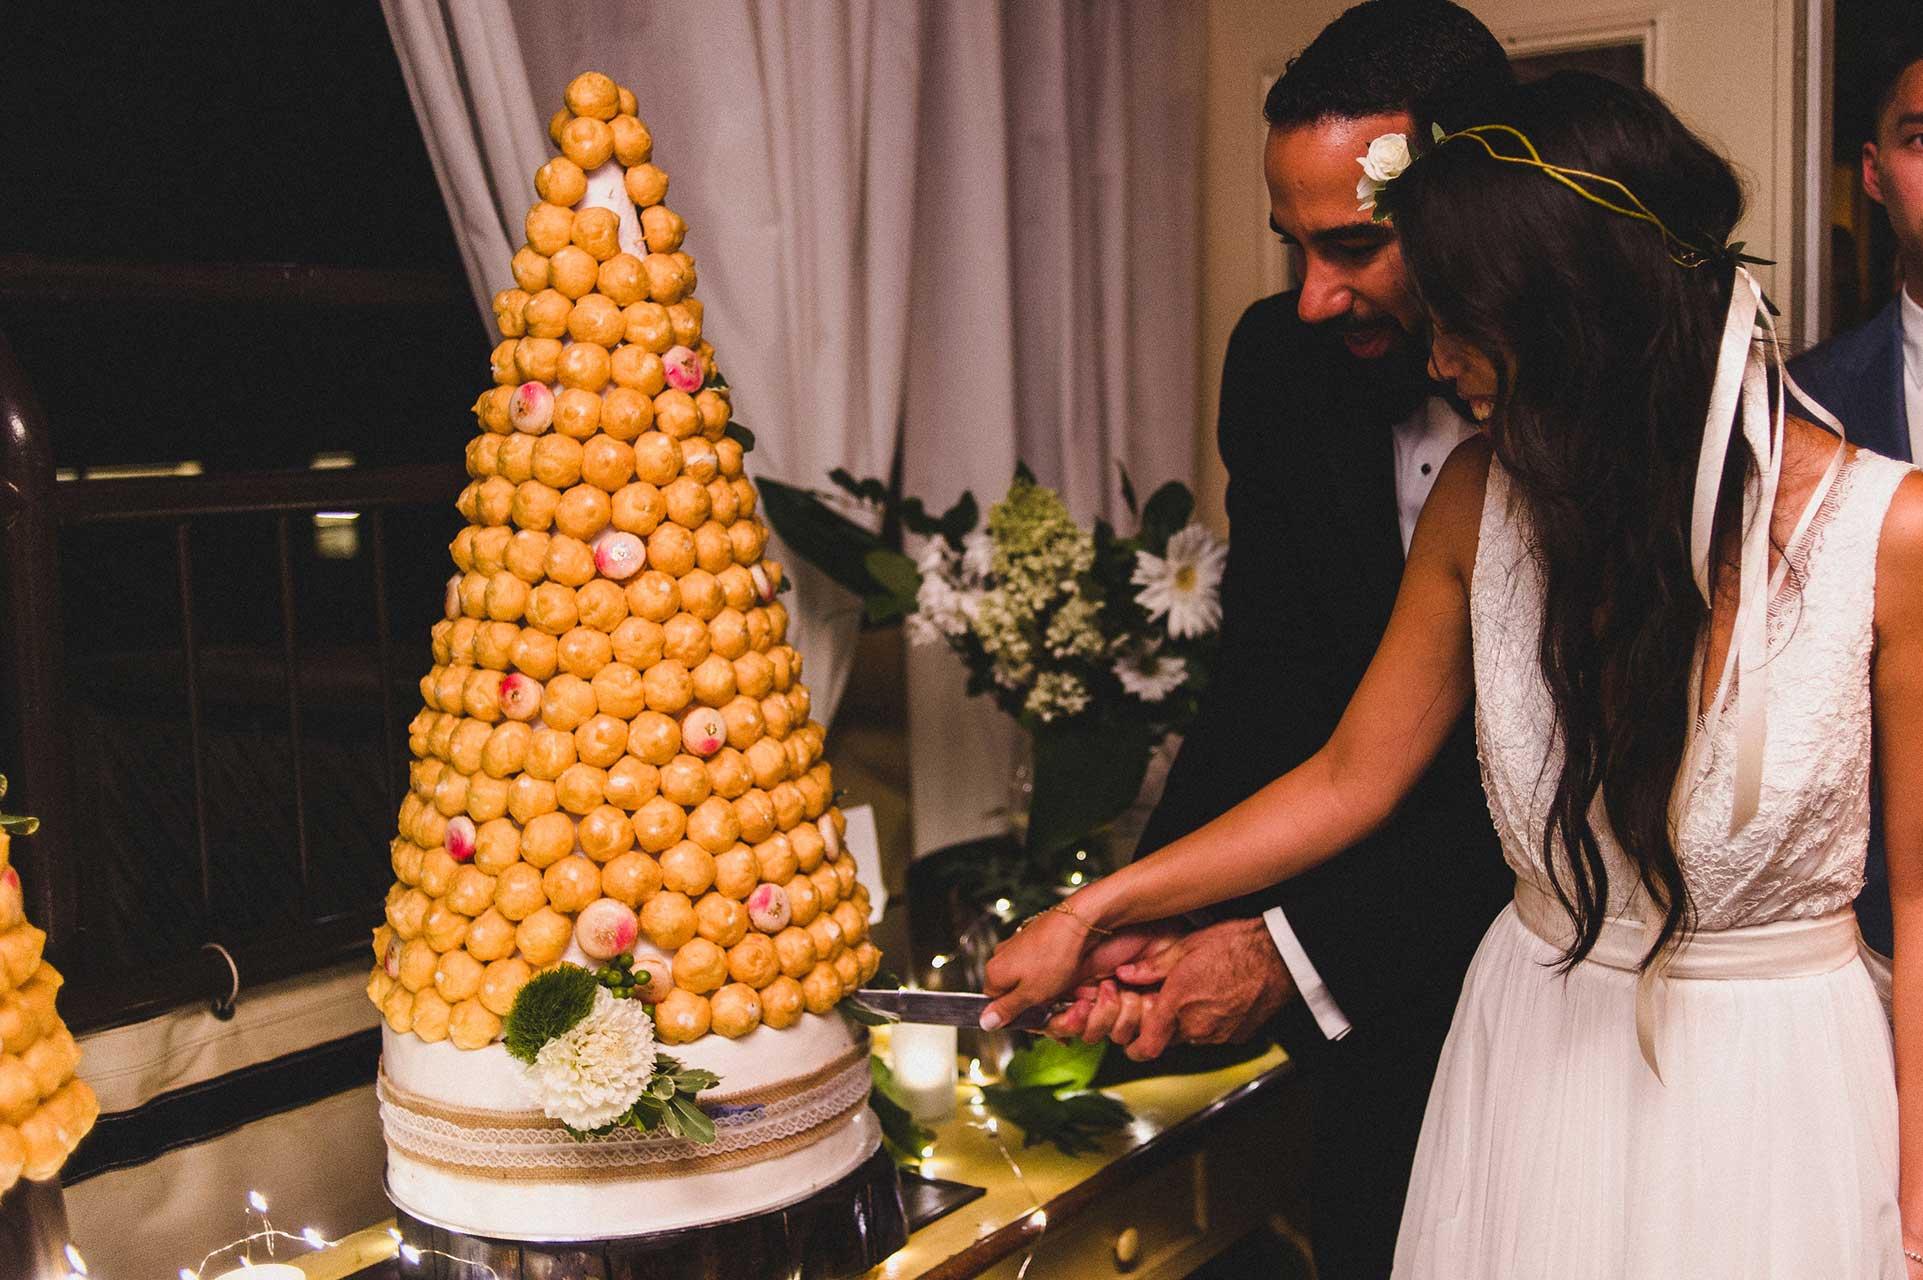 Wedding Venues Toronto - Wedding Cake - Croquembouche Tower